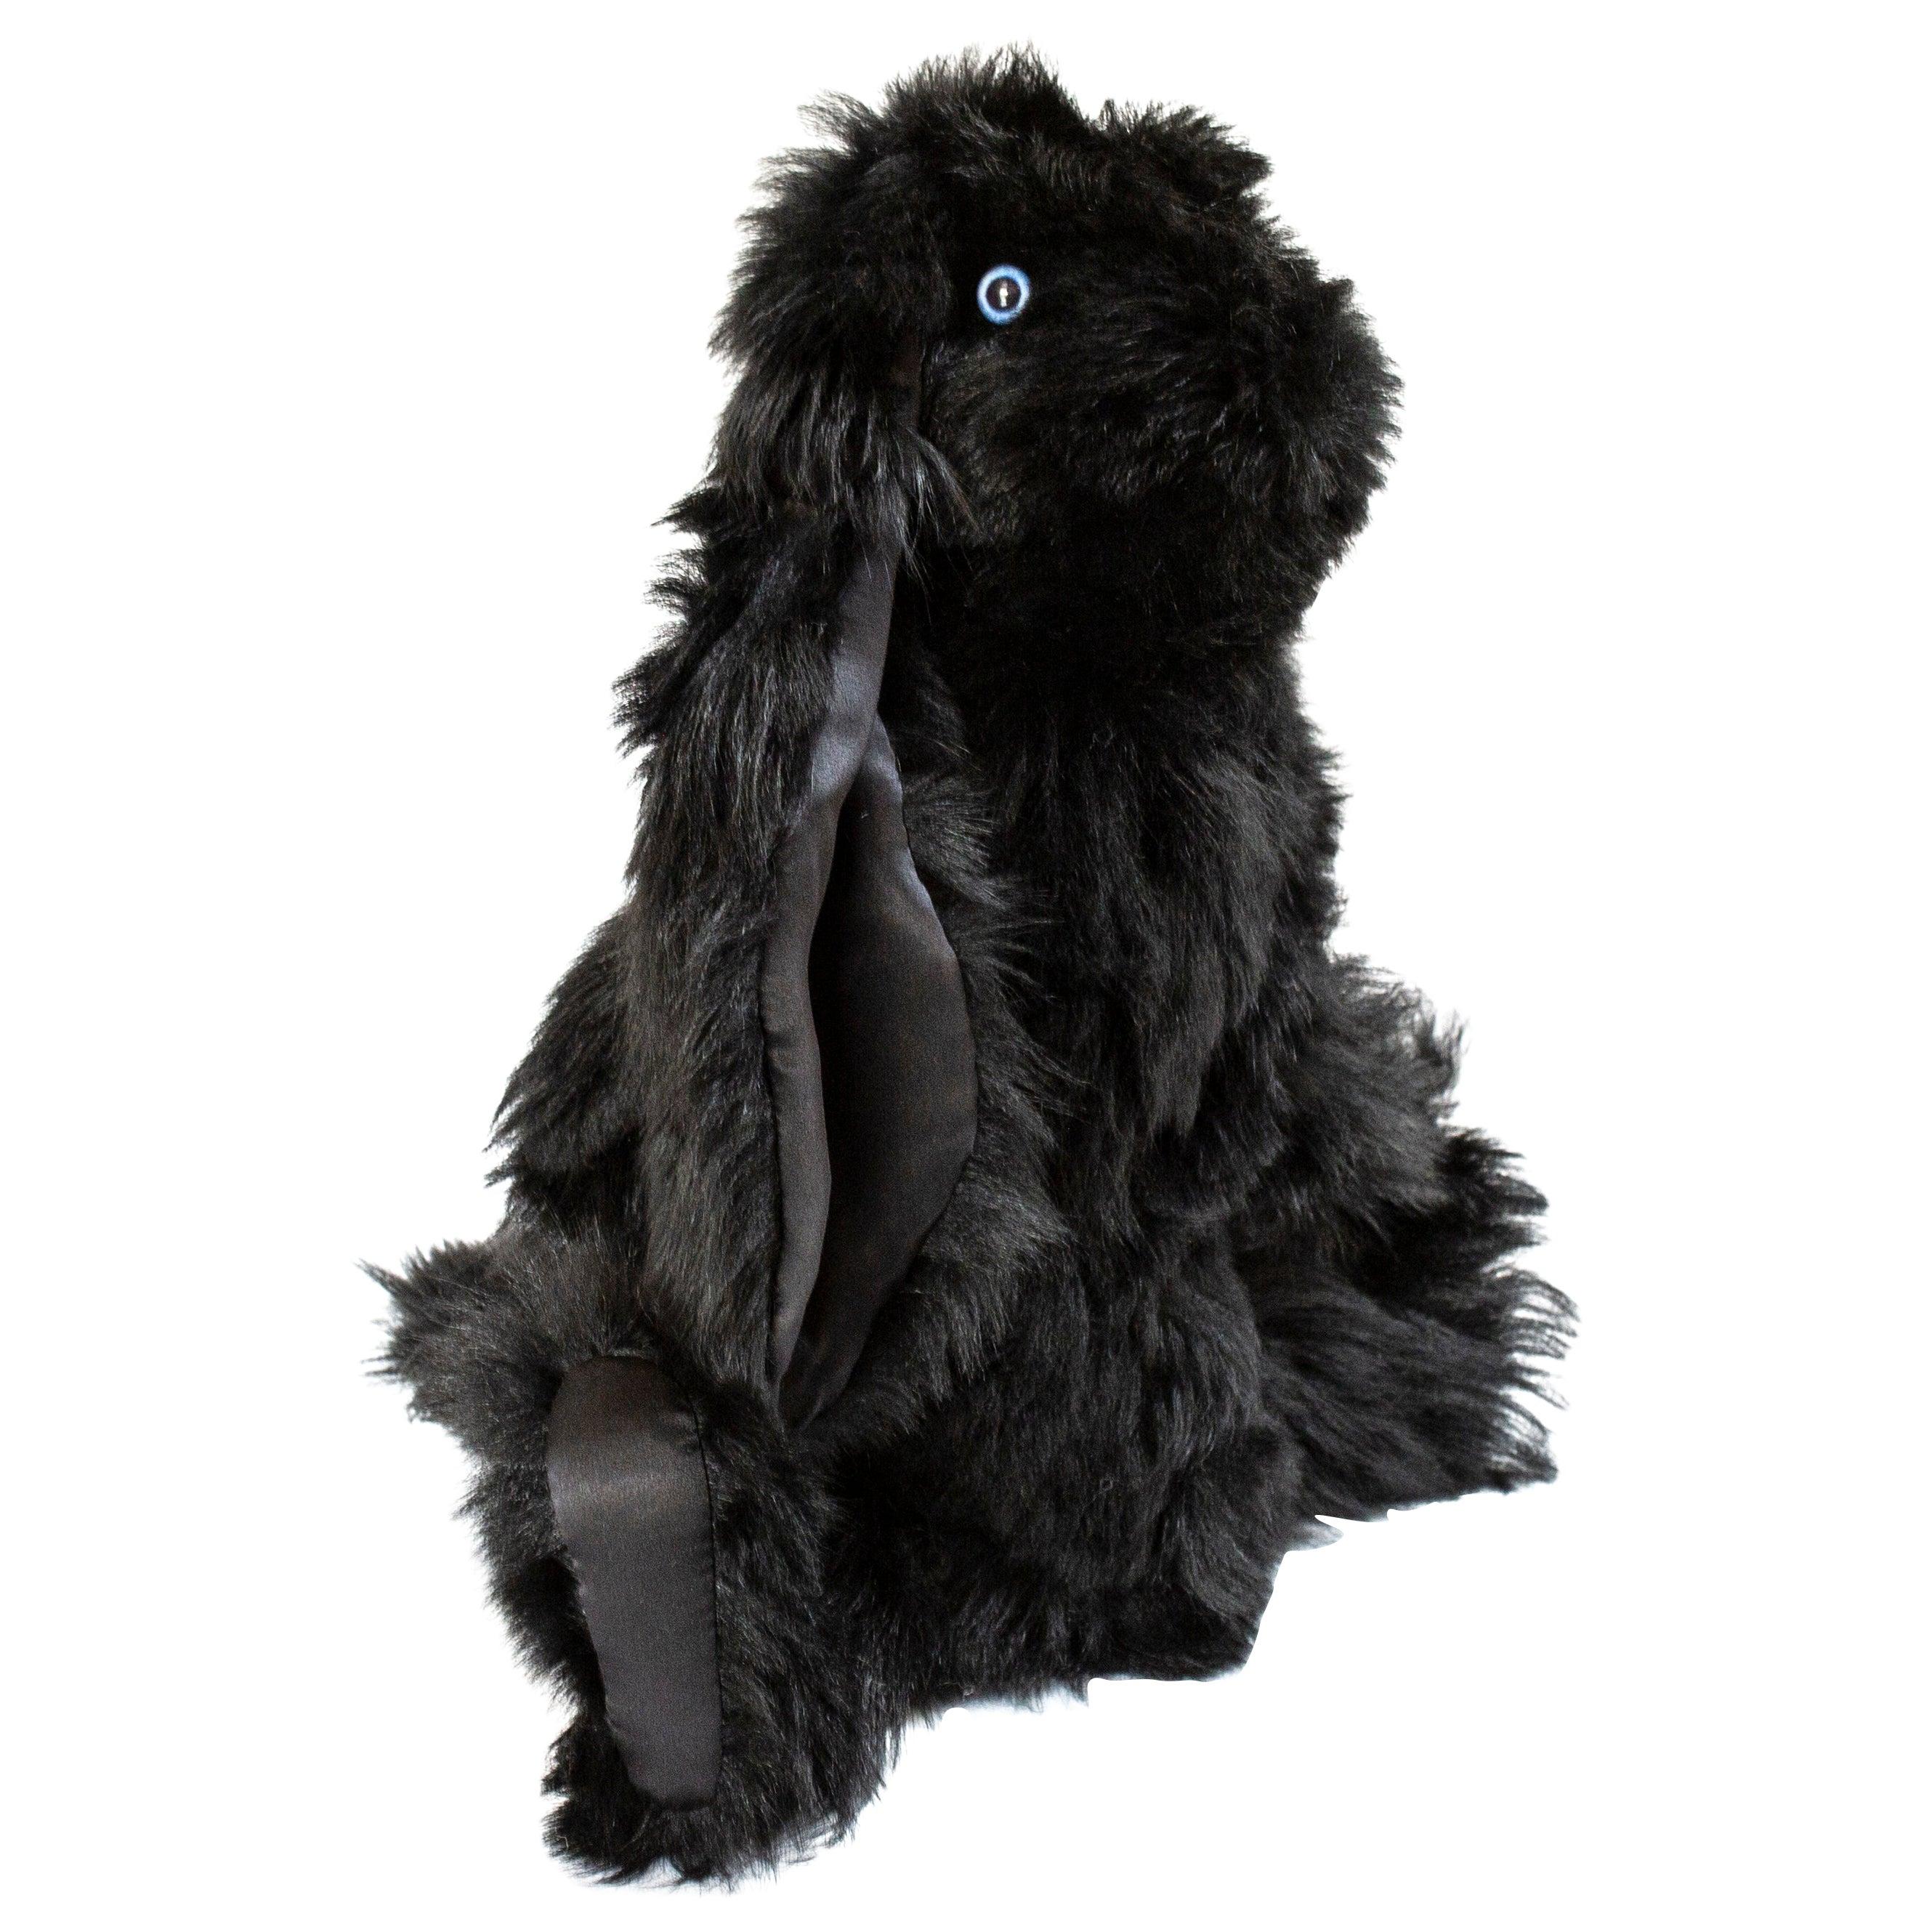 Real Toscana Sheep Black Fur Rabbit Toy